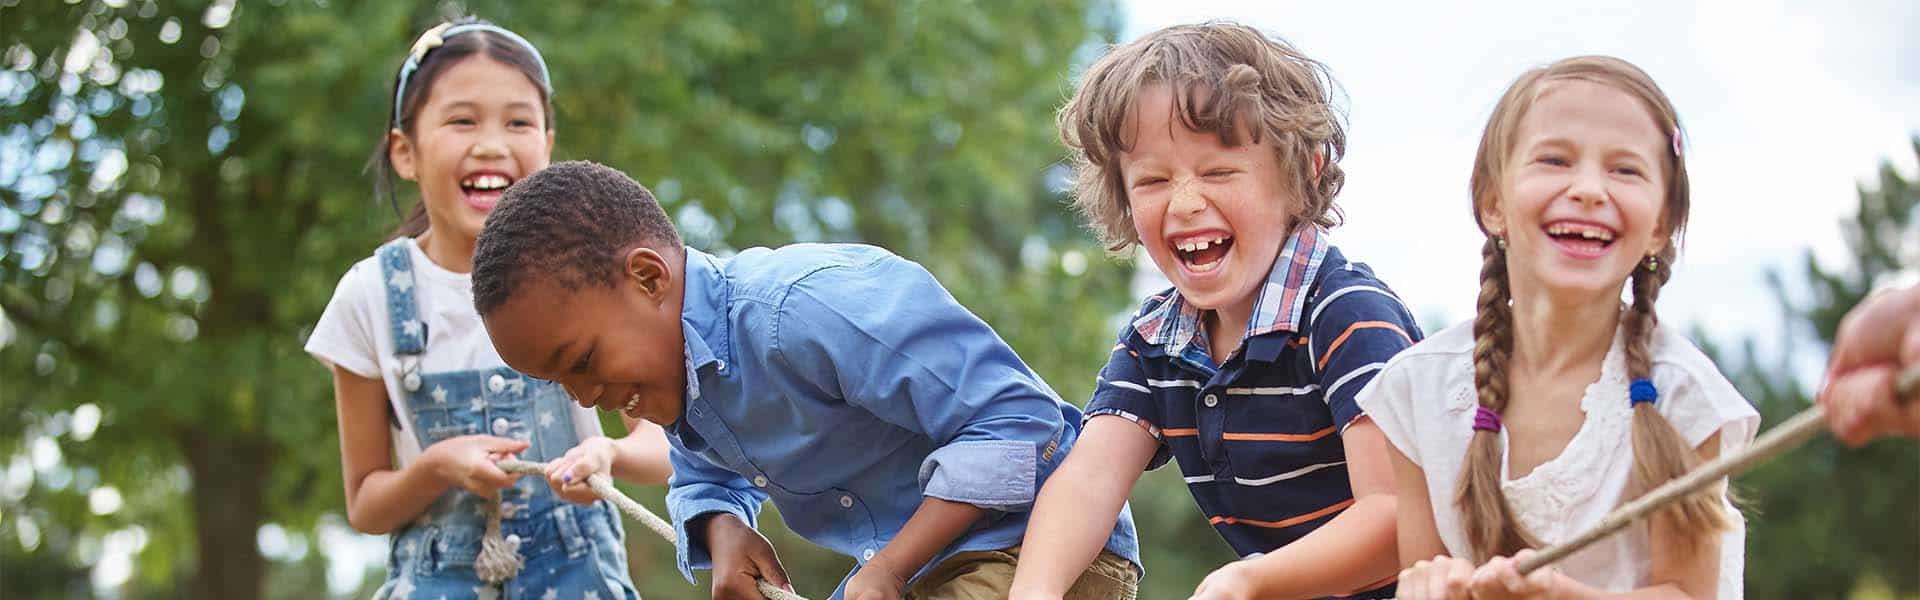 Pediatric Dentistry Hero Image